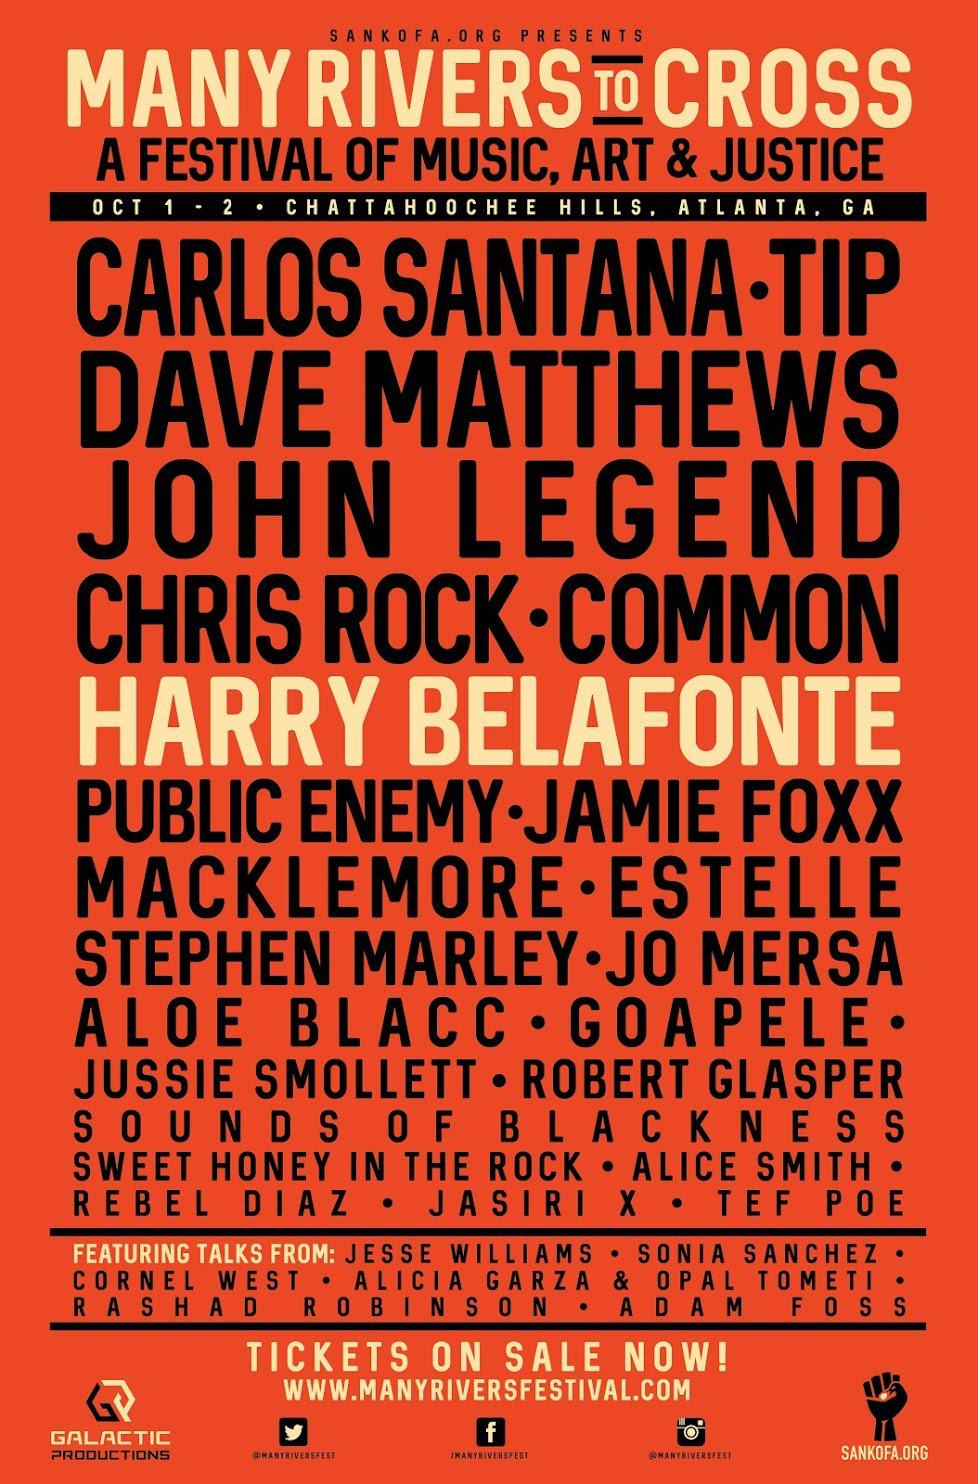 RT @sankofadotorg: Join #ManyRiversFest in ATL on Oct 1-2 Dave Matthews, John Legend, Carlos Santana, Common, & more! https://t.co/WPn520E0…